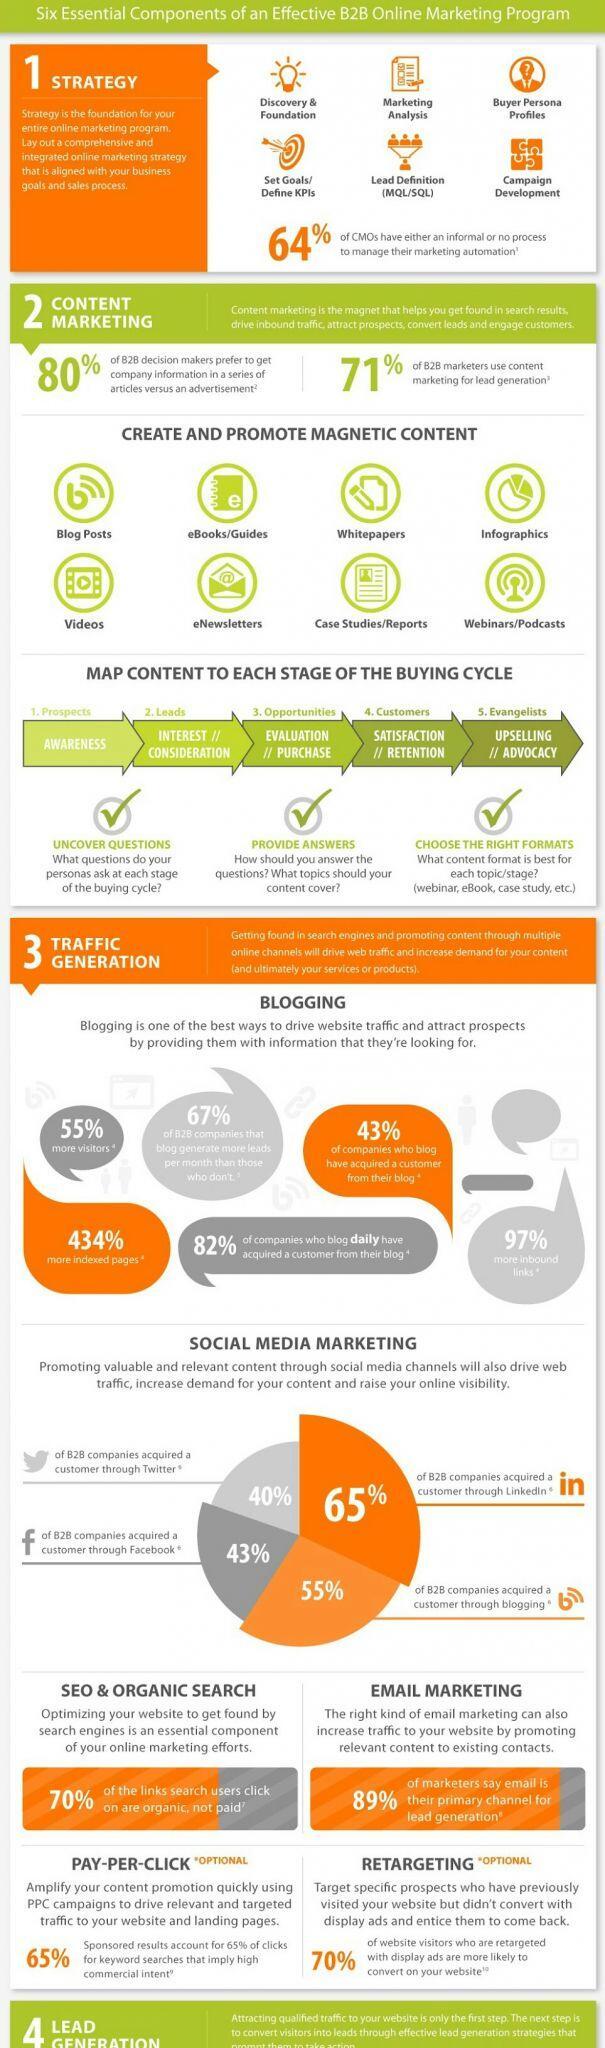 Twitter / gracerodriguez: Helpful #infographic for BtoB ...